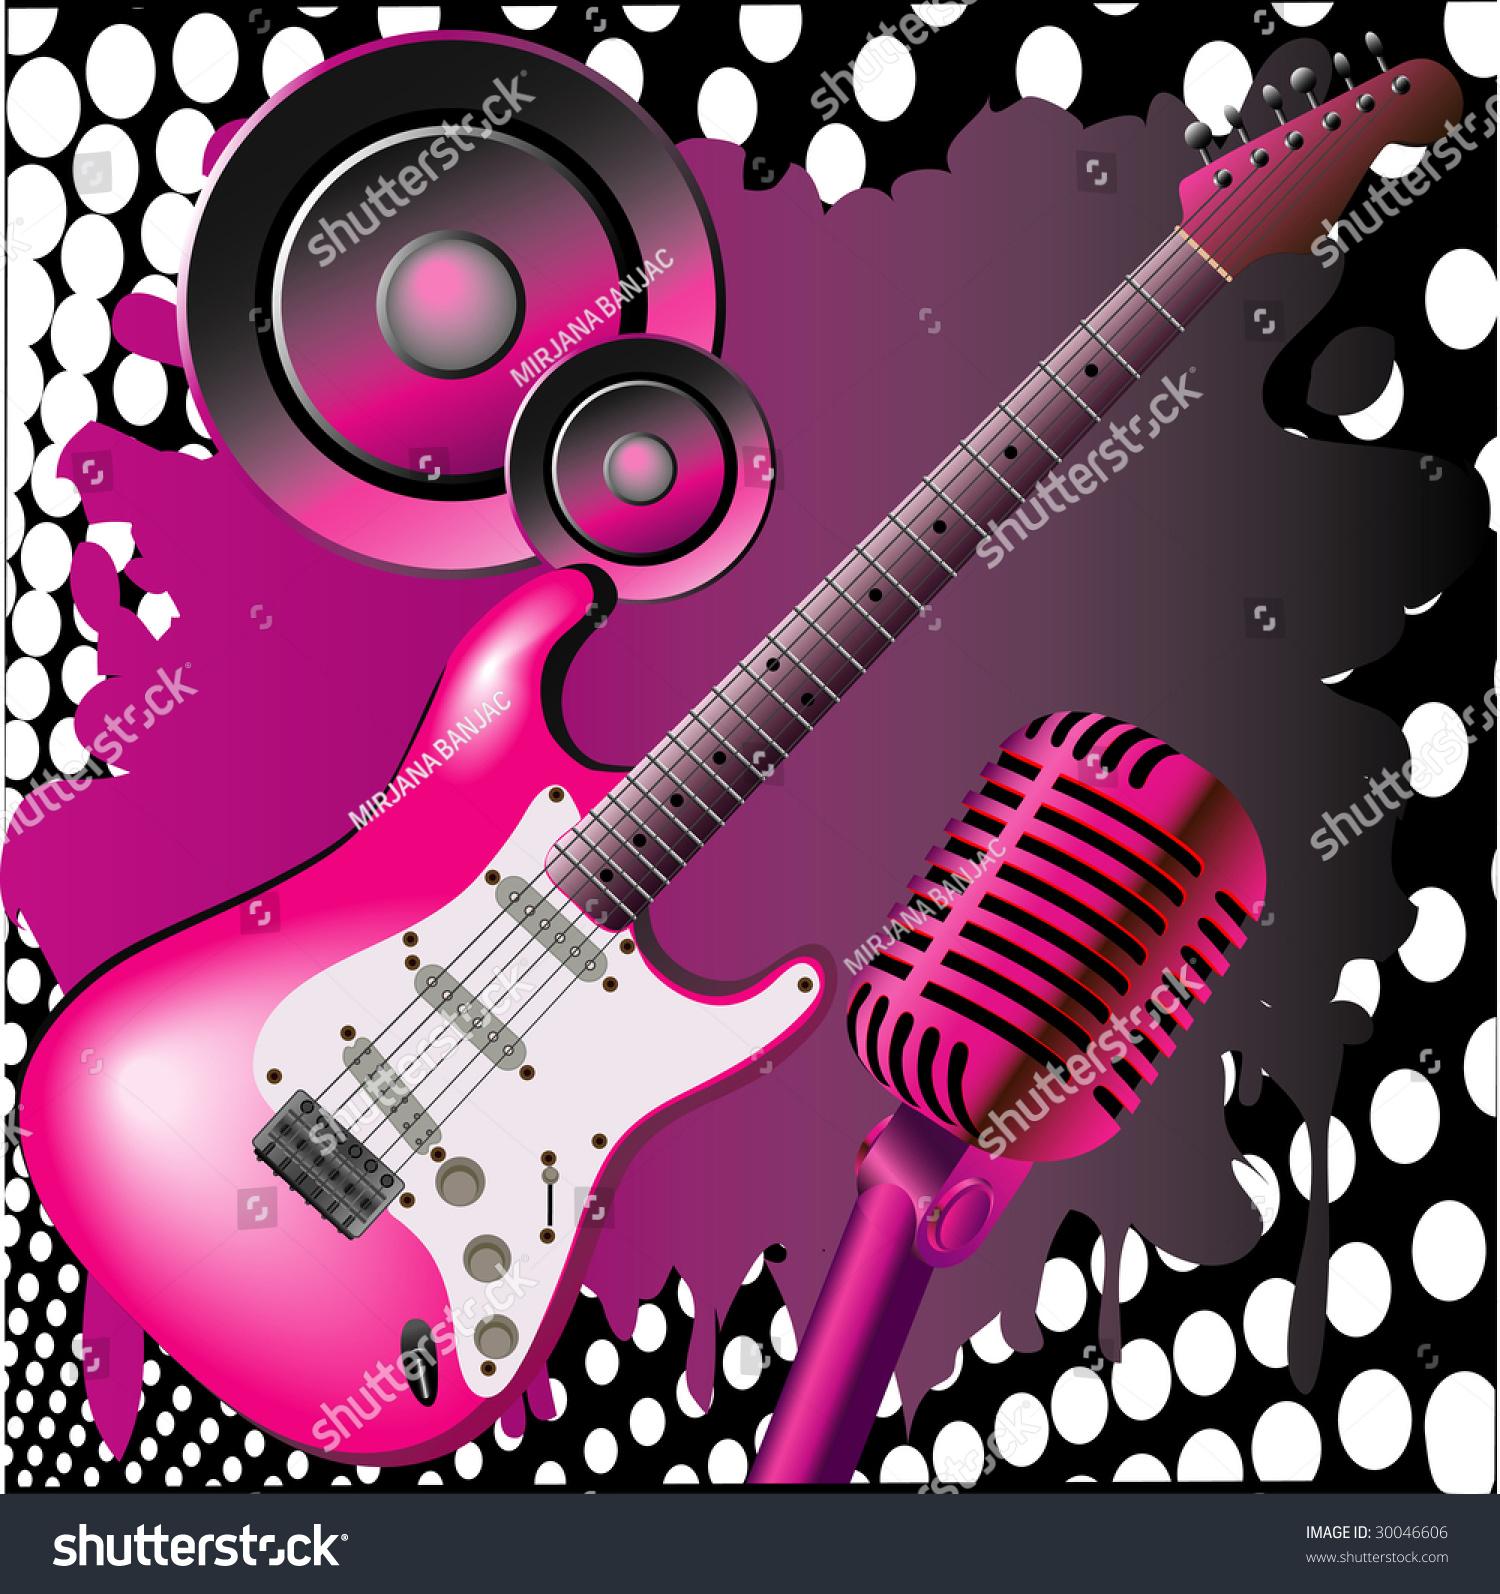 wallpaper music guitar pink - photo #7